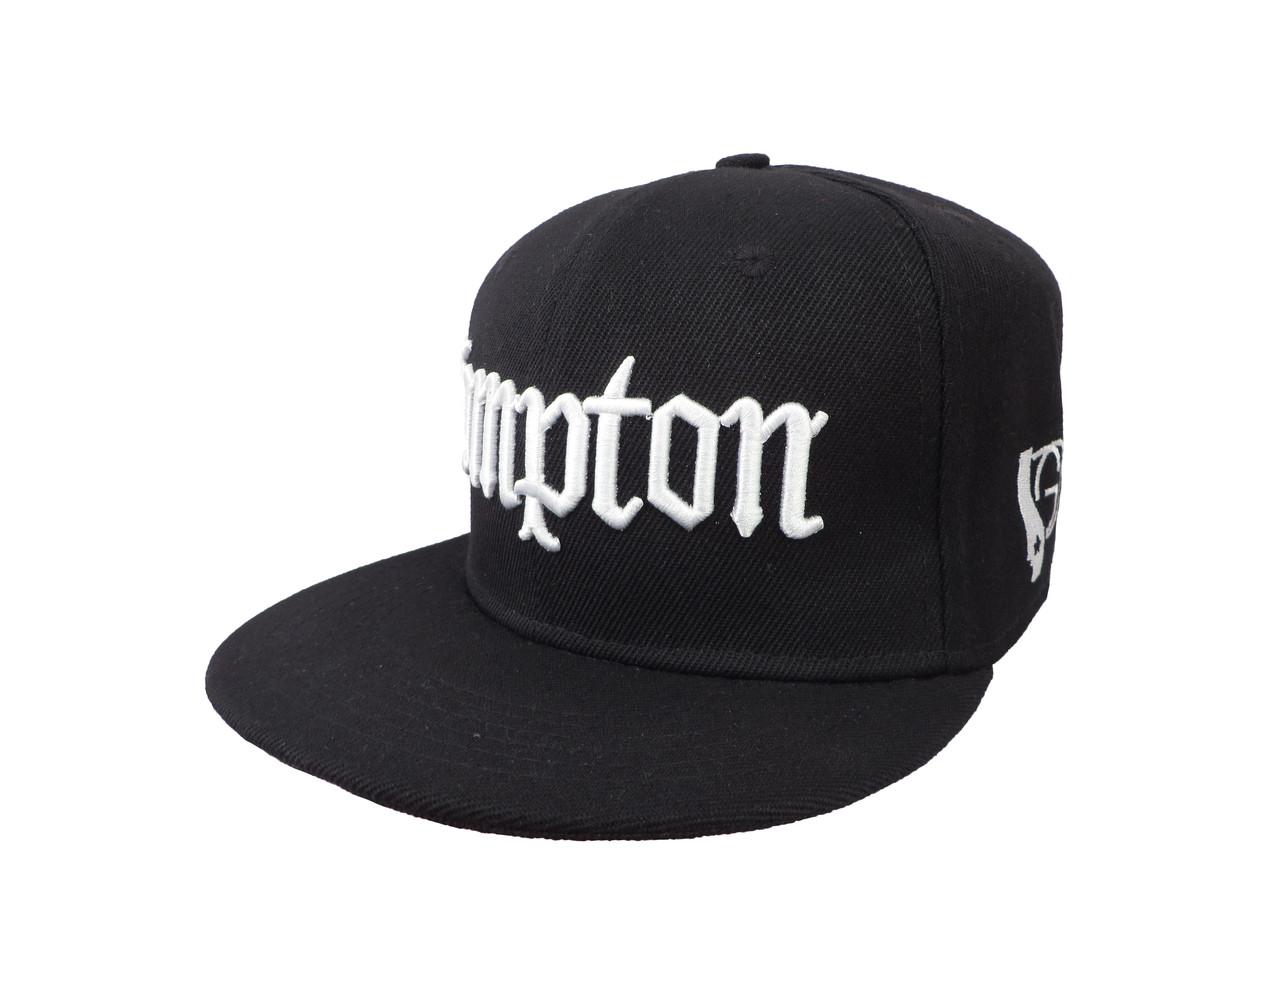 Черная кепка Compton (реплика)